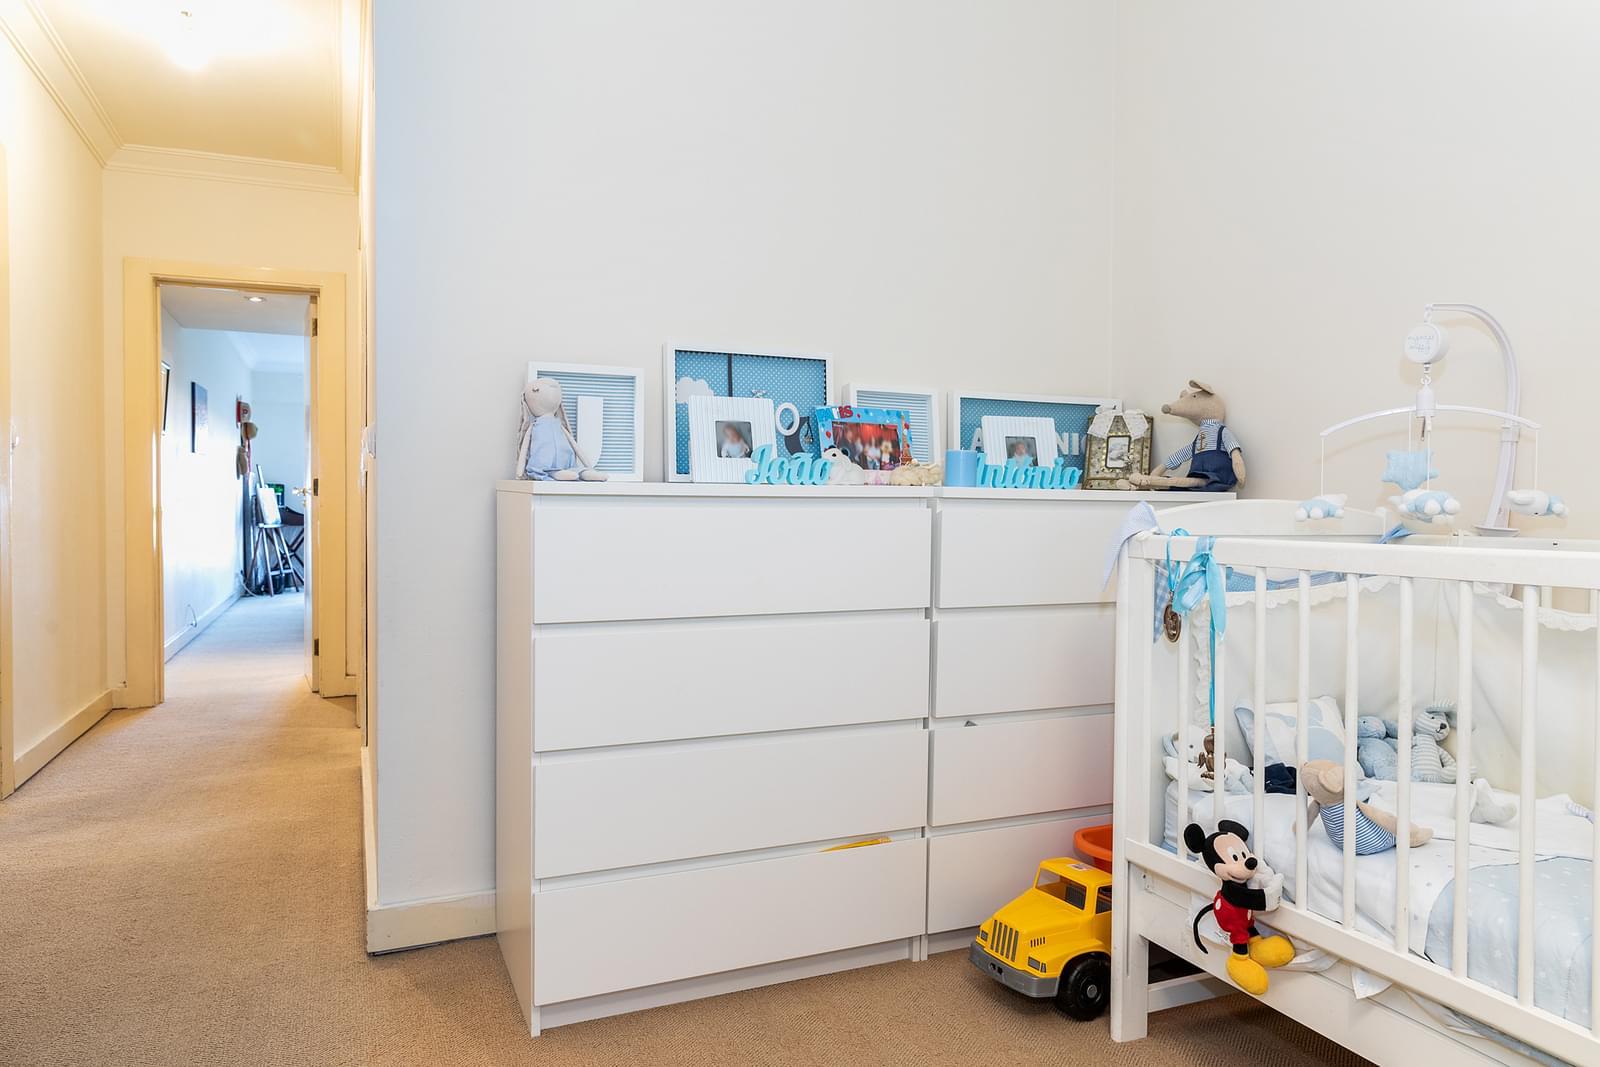 pf18210-apartamento-t4-lisboa-39a7e2ae-8ad3-41d0-b5ce-134517d24e6e